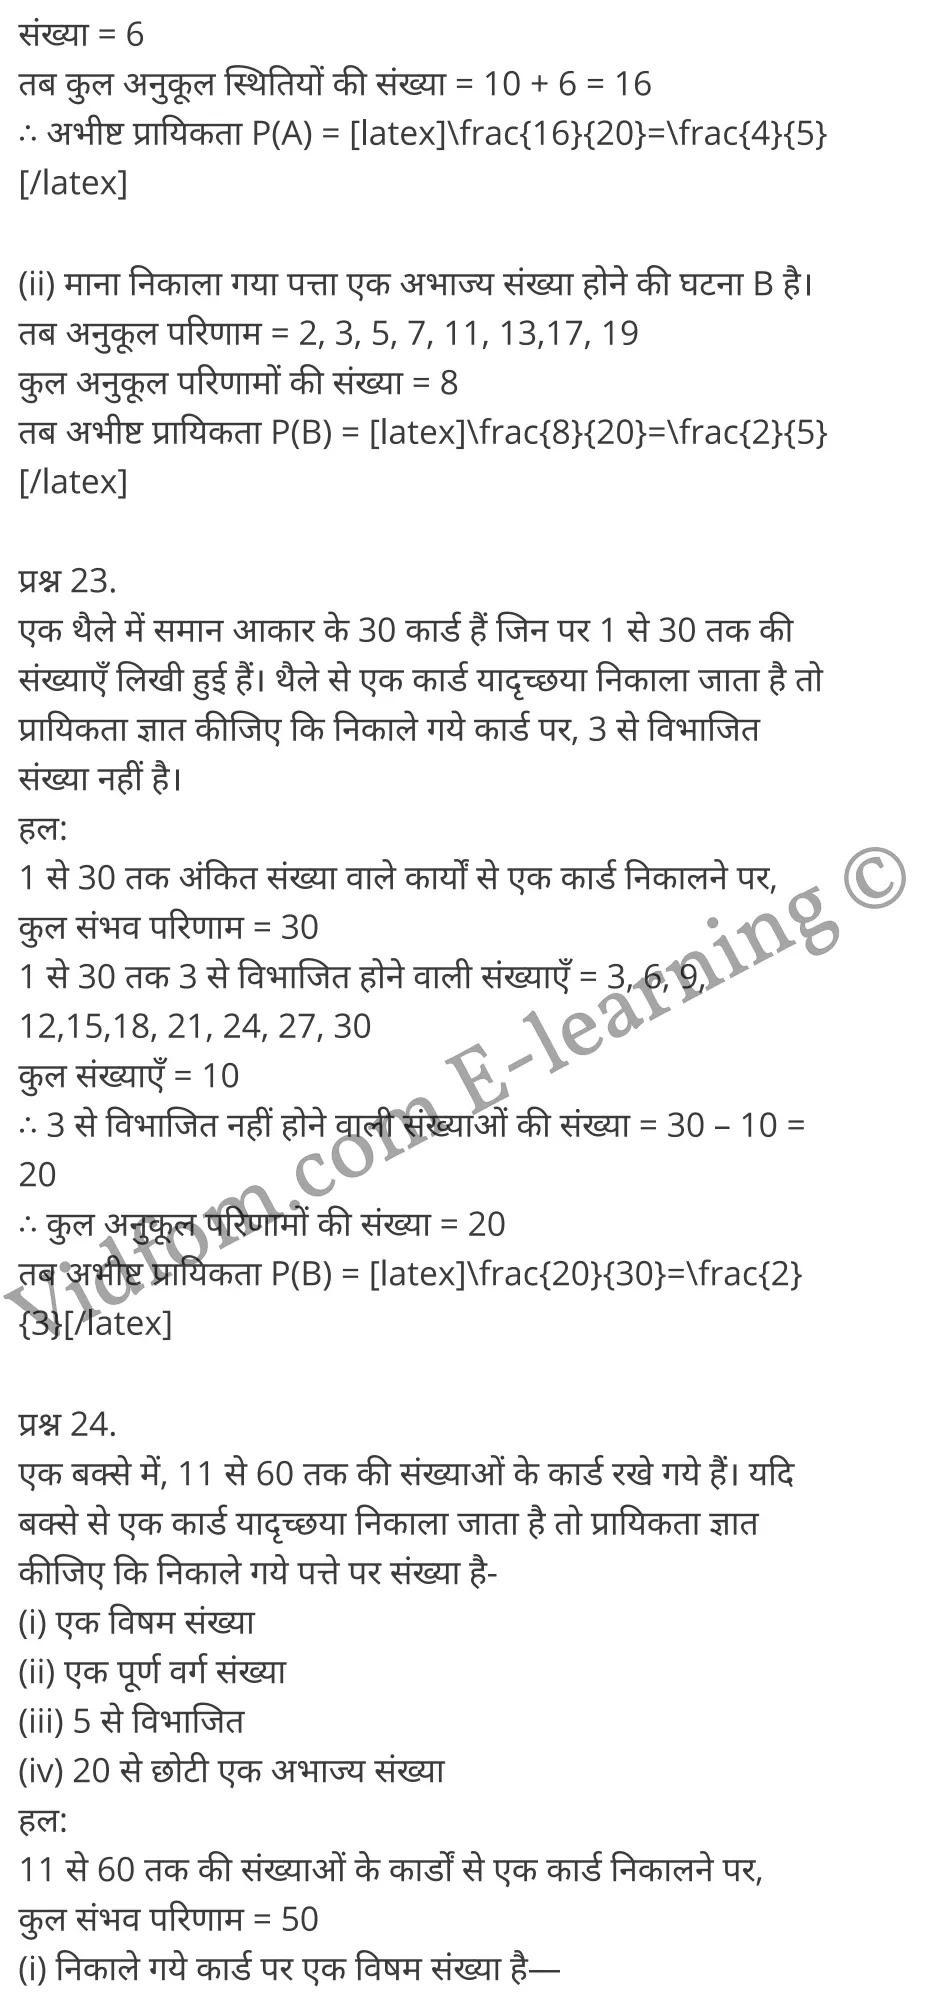 Balaji Maths Book Solutions Class 10 Chapter 15 Probability (प्रायिकता),   Chapter 15 Probability Ex 15.1, कक्षा 10 बालाजी गणित  के नोट्स  हिंदी में एनसीईआरटी समाधान,     class 10 Balaji Maths Chapter 14,   class 10 Balaji Maths Chapter 14 ncert solutions in Hindi,   class 10 Balaji Maths Chapter 14 notes in hindi,   class 10 Balaji Maths Chapter 14 question answer,   class 10 Balaji Maths Chapter 14 notes,   class 10 Balaji Maths Chapter 14 class 10 Balaji Maths Chapter 14 in  hindi,    class 10 Balaji Maths Chapter 14 important questions in  hindi,   class 10 Balaji Maths Chapter 14 notes in hindi,    class 10 Balaji Maths Chapter 14 test,   class 10 Balaji Maths Chapter 14 pdf,   class 10 Balaji Maths Chapter 14 notes pdf,   class 10 Balaji Maths Chapter 14 exercise solutions,   class 10 Balaji Maths Chapter 14 notes study rankers,   class 10 Balaji Maths Chapter 14 notes,    class 10 Balaji Maths Chapter 14  class 10  notes pdf,   class 10 Balaji Maths Chapter 14 class 10  notes  ncert,   class 10 Balaji Maths Chapter 14 class 10 pdf,   class 10 Balaji Maths Chapter 14  book,   class 10 Balaji Maths Chapter 14 quiz class 10  ,    10  th class 10 Balaji Maths Chapter 14  book up board,   up board 10  th class 10 Balaji Maths Chapter 14 notes,  class 10 Balaji Maths,   class 10 Balaji Maths ncert solutions in Hindi,   class 10 Balaji Maths notes in hindi,   class 10 Balaji Maths question answer,   class 10 Balaji Maths notes,  class 10 Balaji Maths class 10 Balaji Maths Chapter 14 in  hindi,    class 10 Balaji Maths important questions in  hindi,   class 10 Balaji Maths notes in hindi,    class 10 Balaji Maths test,  class 10 Balaji Maths class 10 Balaji Maths Chapter 14 pdf,   class 10 Balaji Maths notes pdf,   class 10 Balaji Maths exercise solutions,   class 10 Balaji Maths,  class 10 Balaji Maths notes study rankers,   class 10 Balaji Maths notes,  class 10 Balaji Maths notes,   class 10 Balaji Maths  class 10  notes pdf,   class 10 Balaji Maths class 10  note